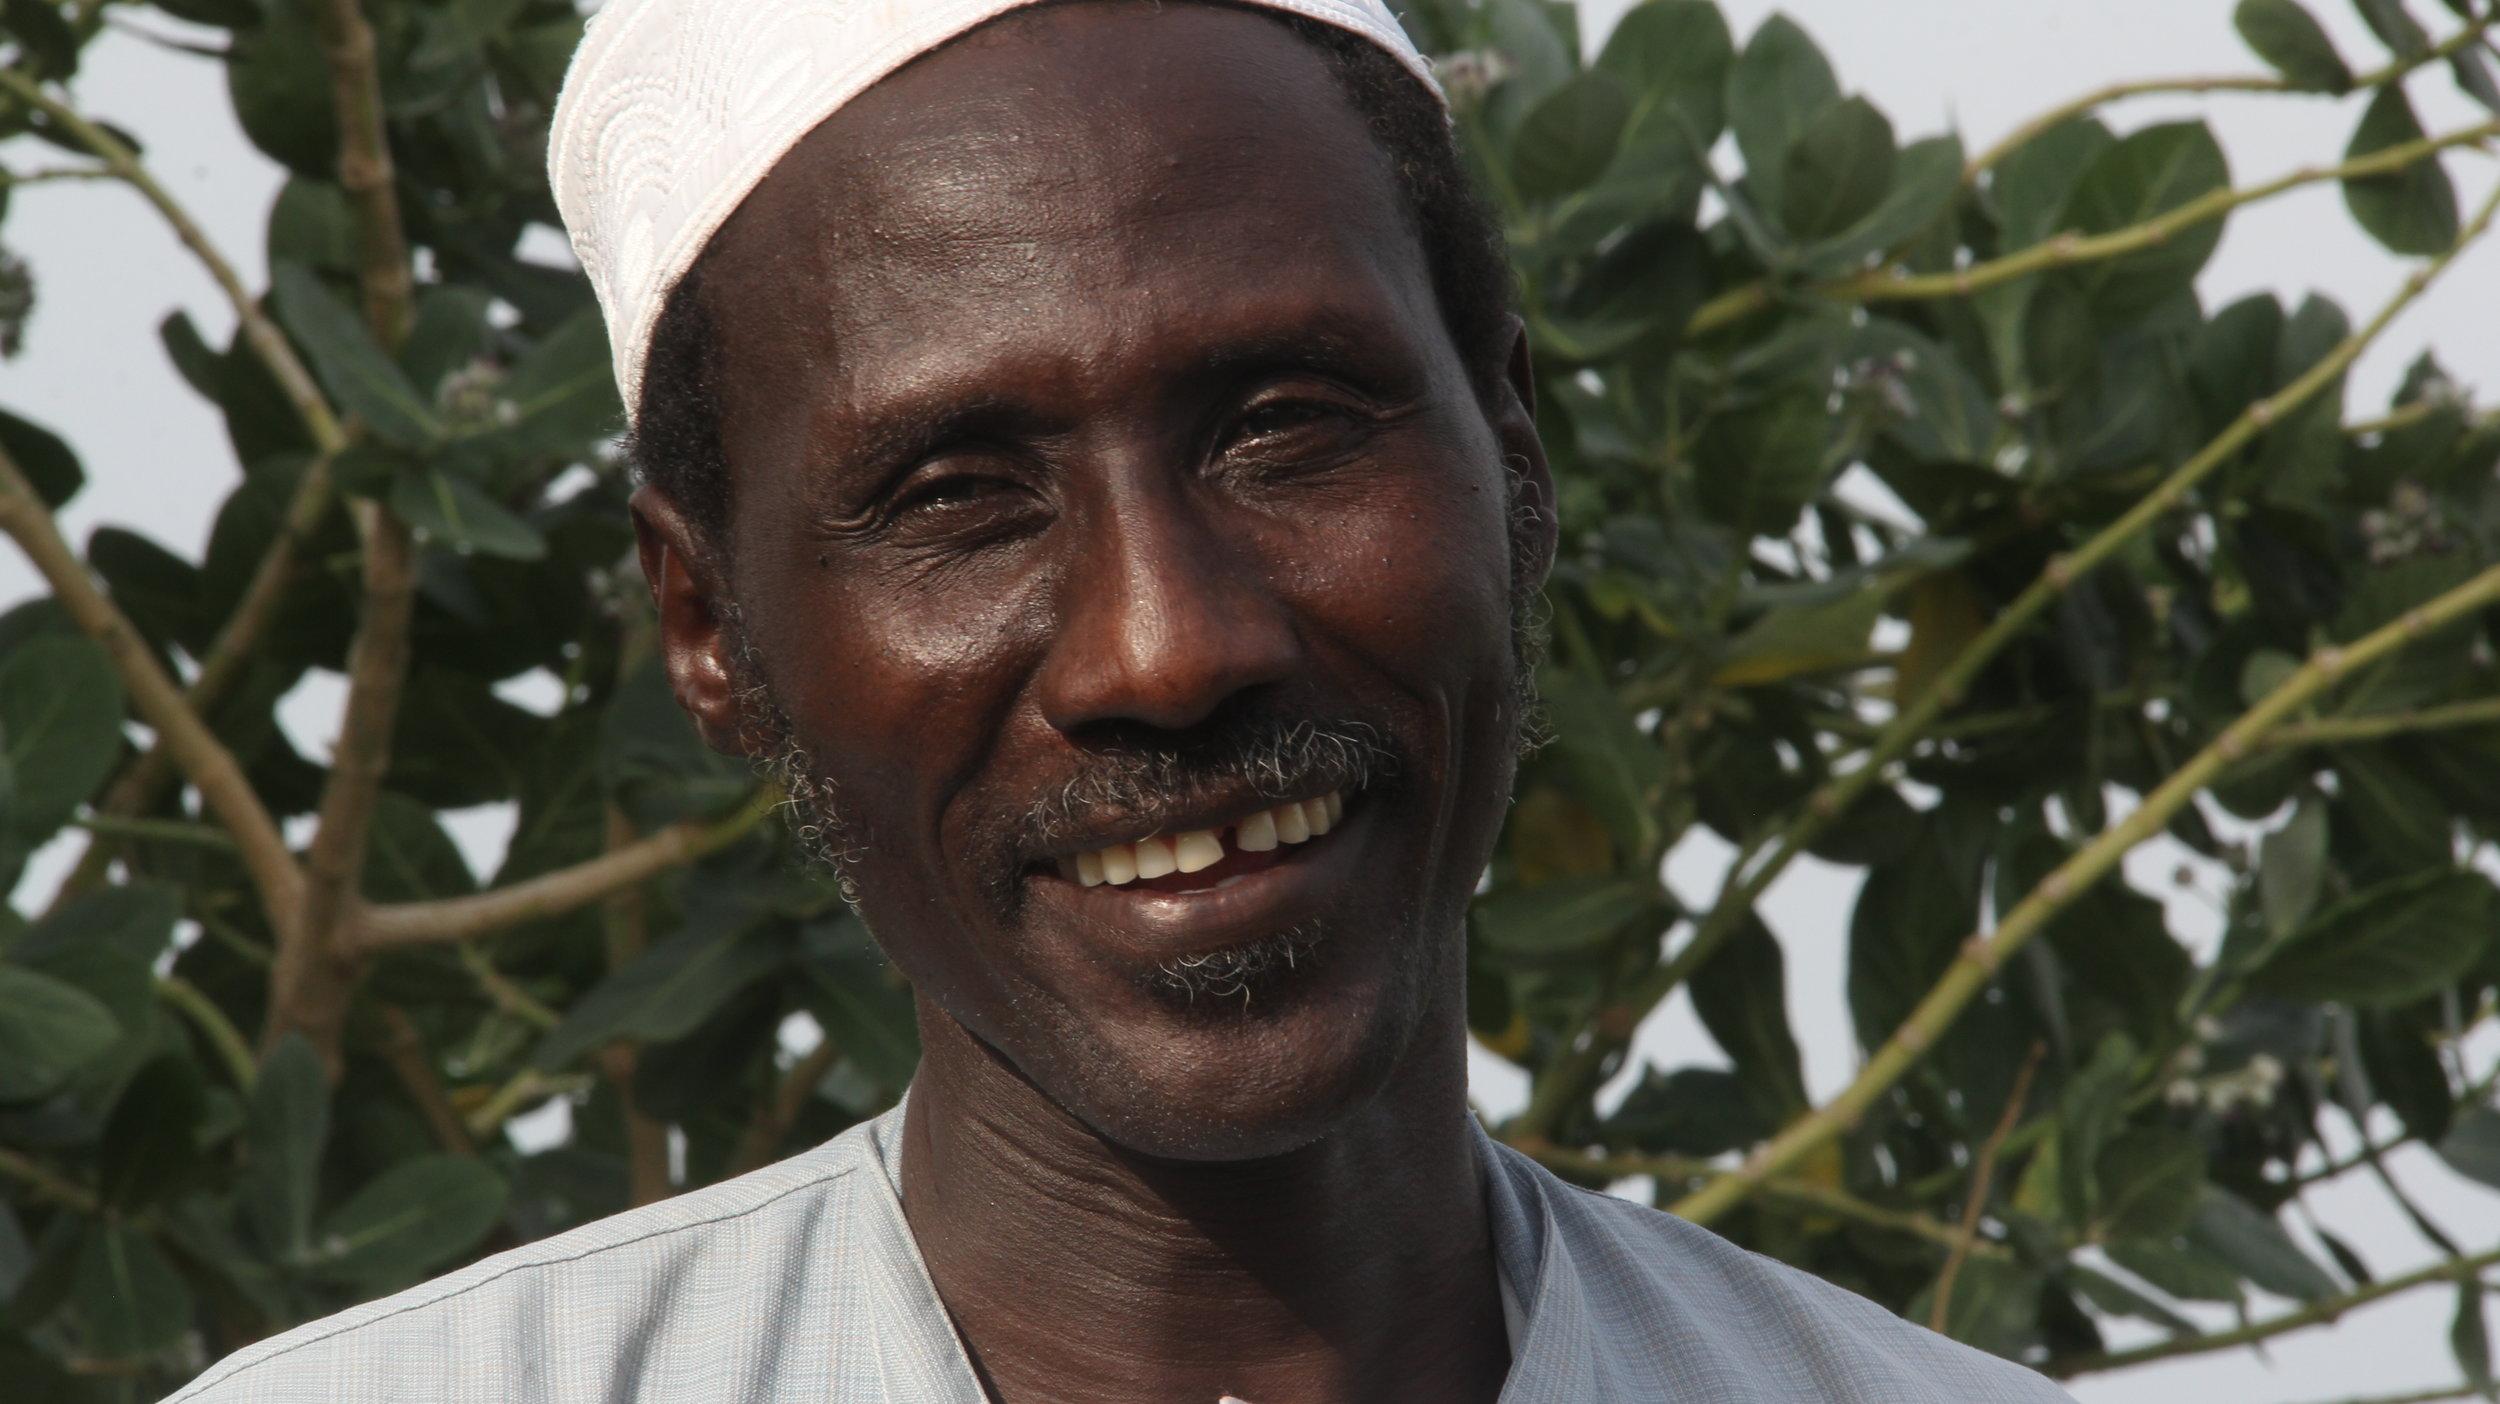 Farmer 50 years old WHH Wad Elhilew, Kassala State